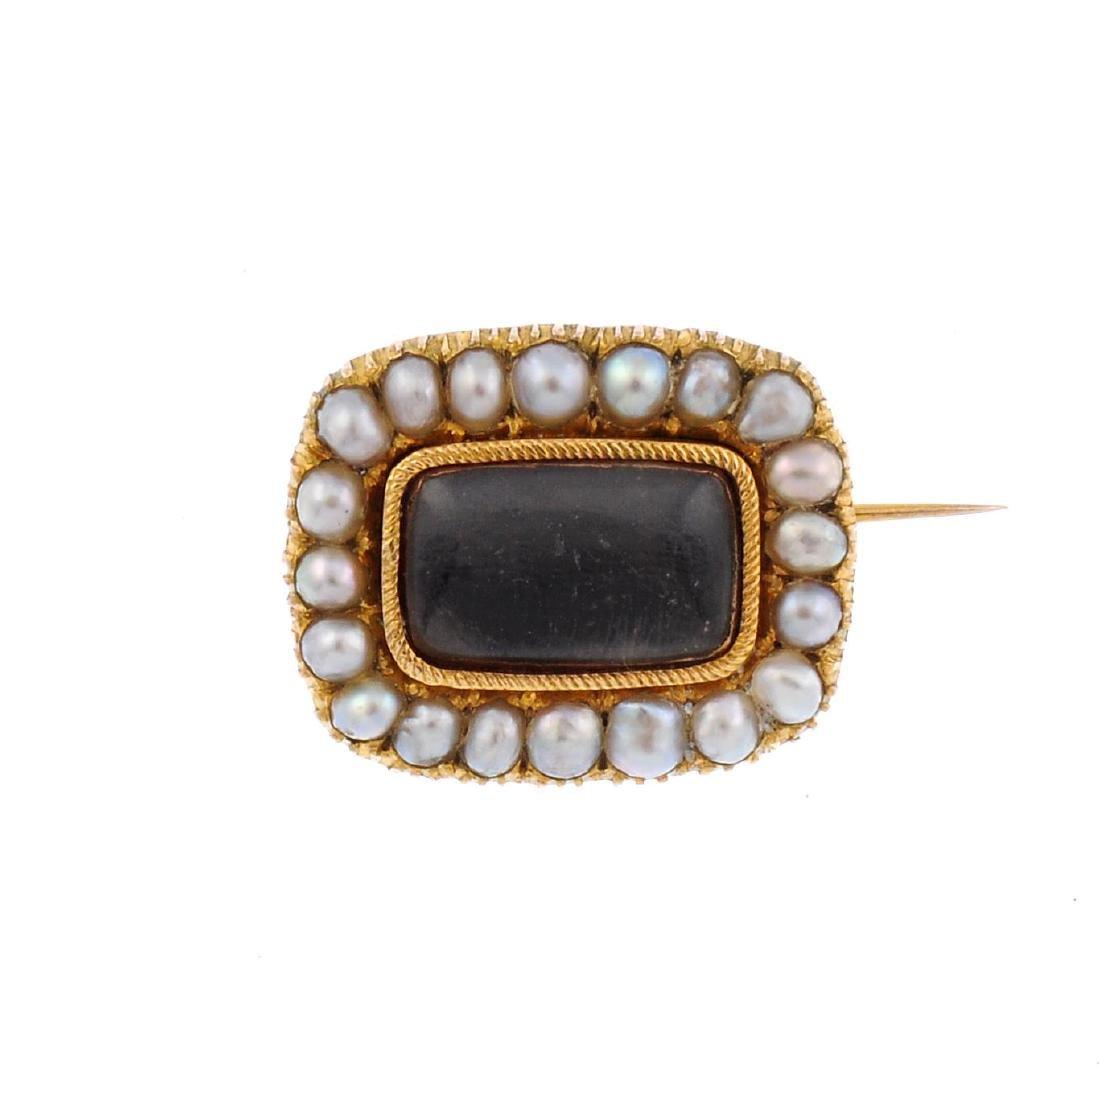 A late Georgian gold split pearl memorial brooch. Of